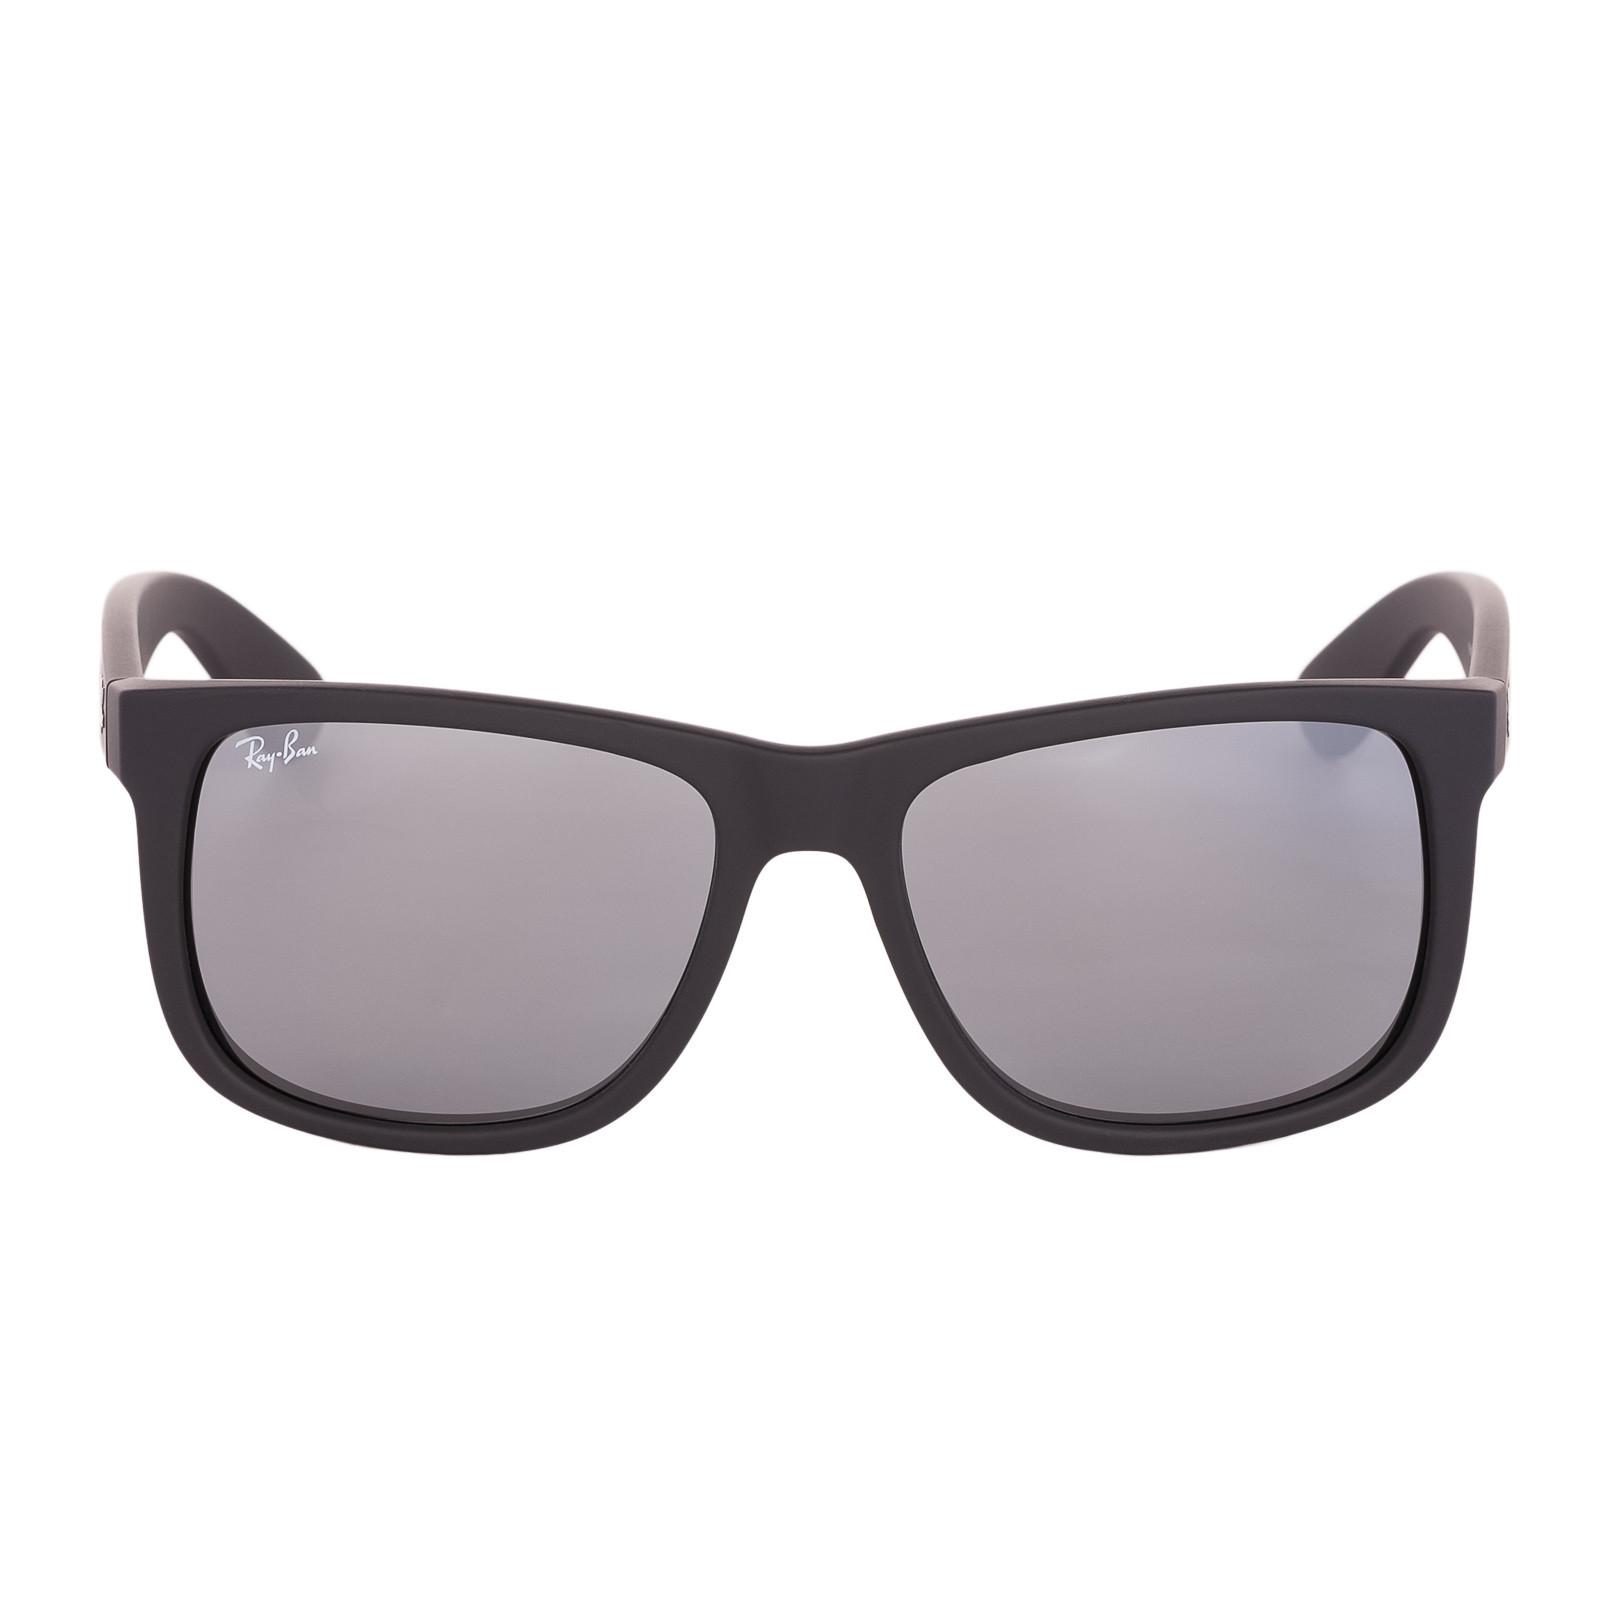 7f39f3e893 ... Gafas de Sol RB4165 622/6G. Ray-Ban Justin zonnebril Rubber Black  RB4165 622/6G. -10%. Ray-Ban ...